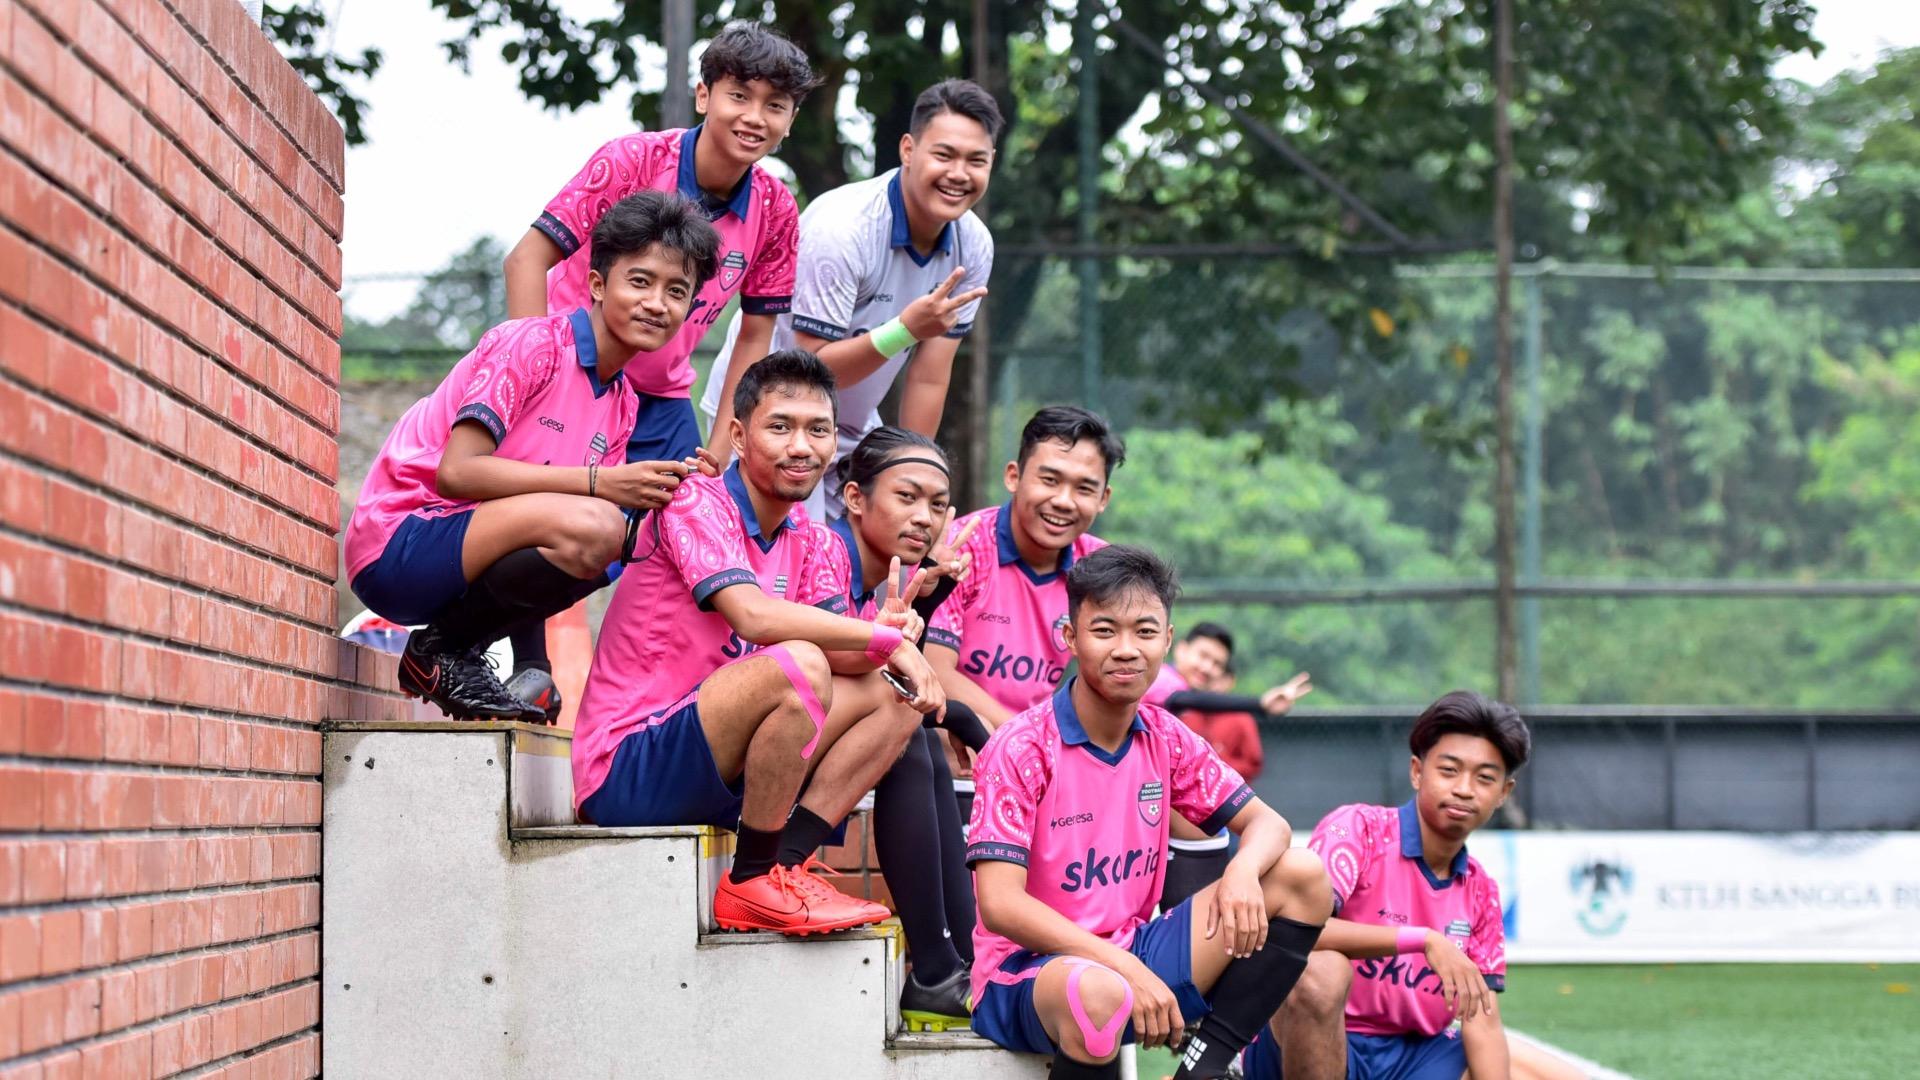 sweetfootballindonesia_